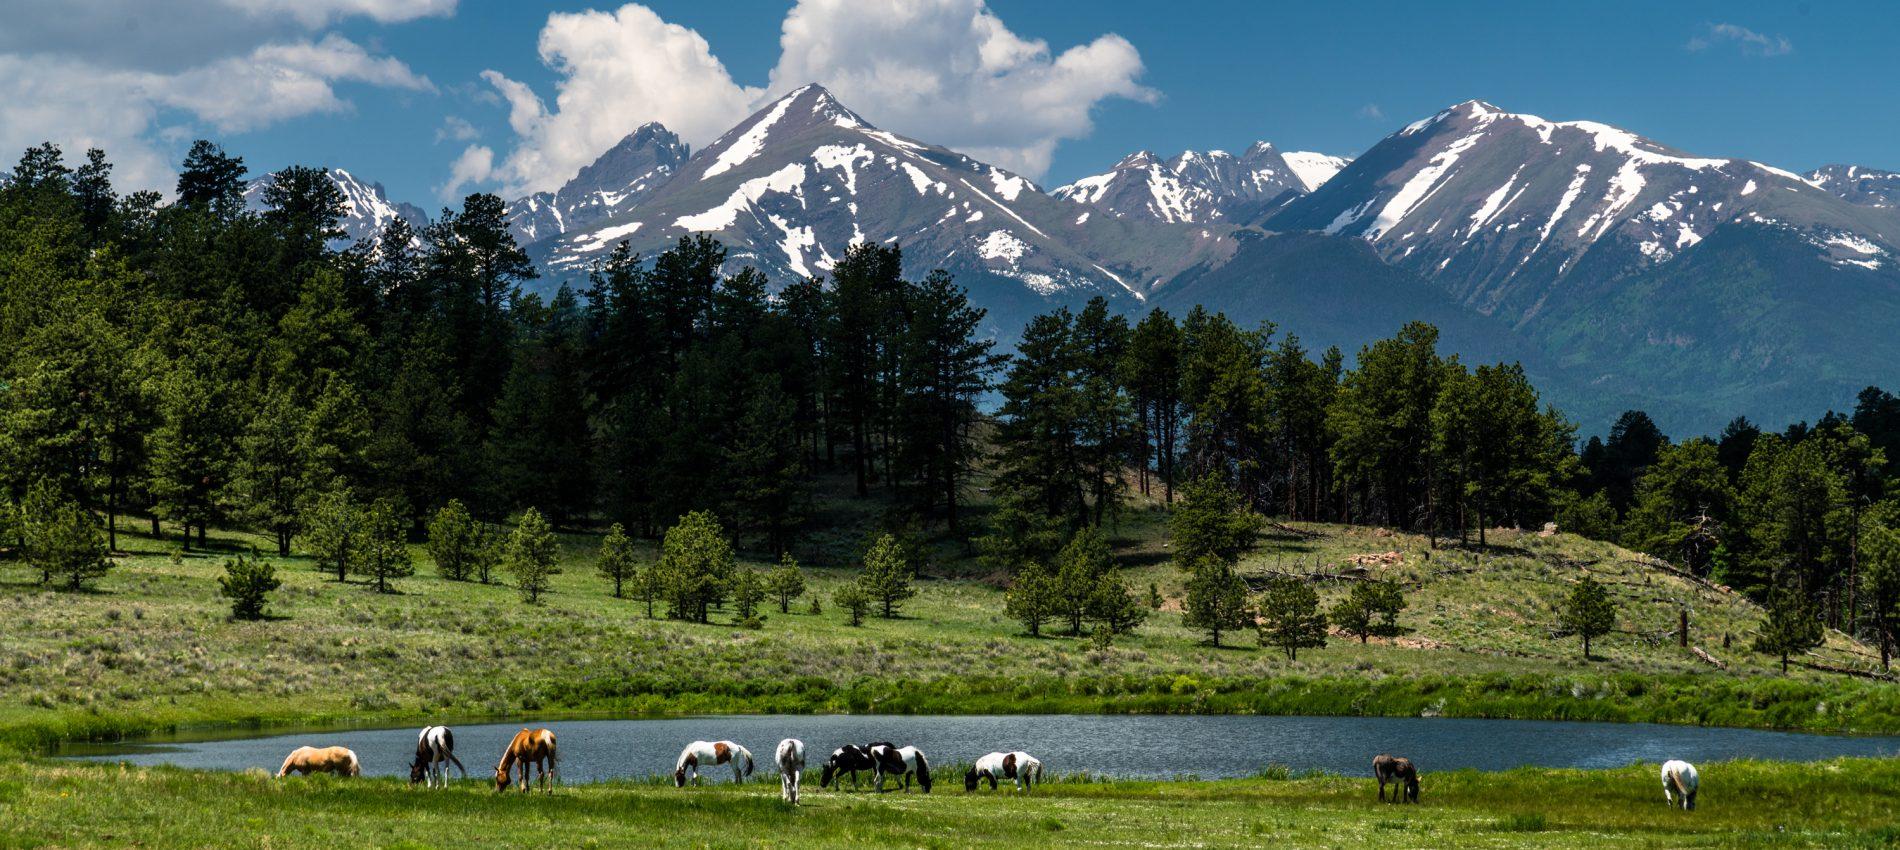 Wet Mountain Valley Scenery